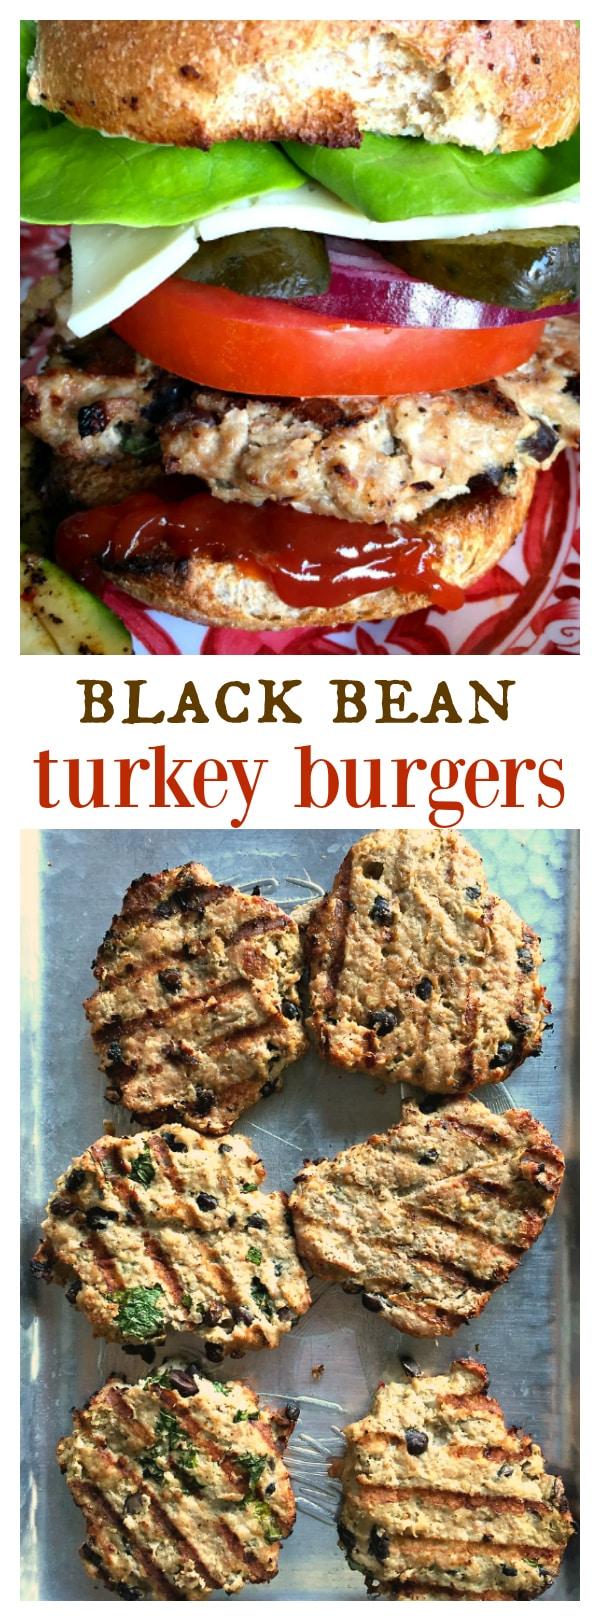 Black Bean Turkey Burgers